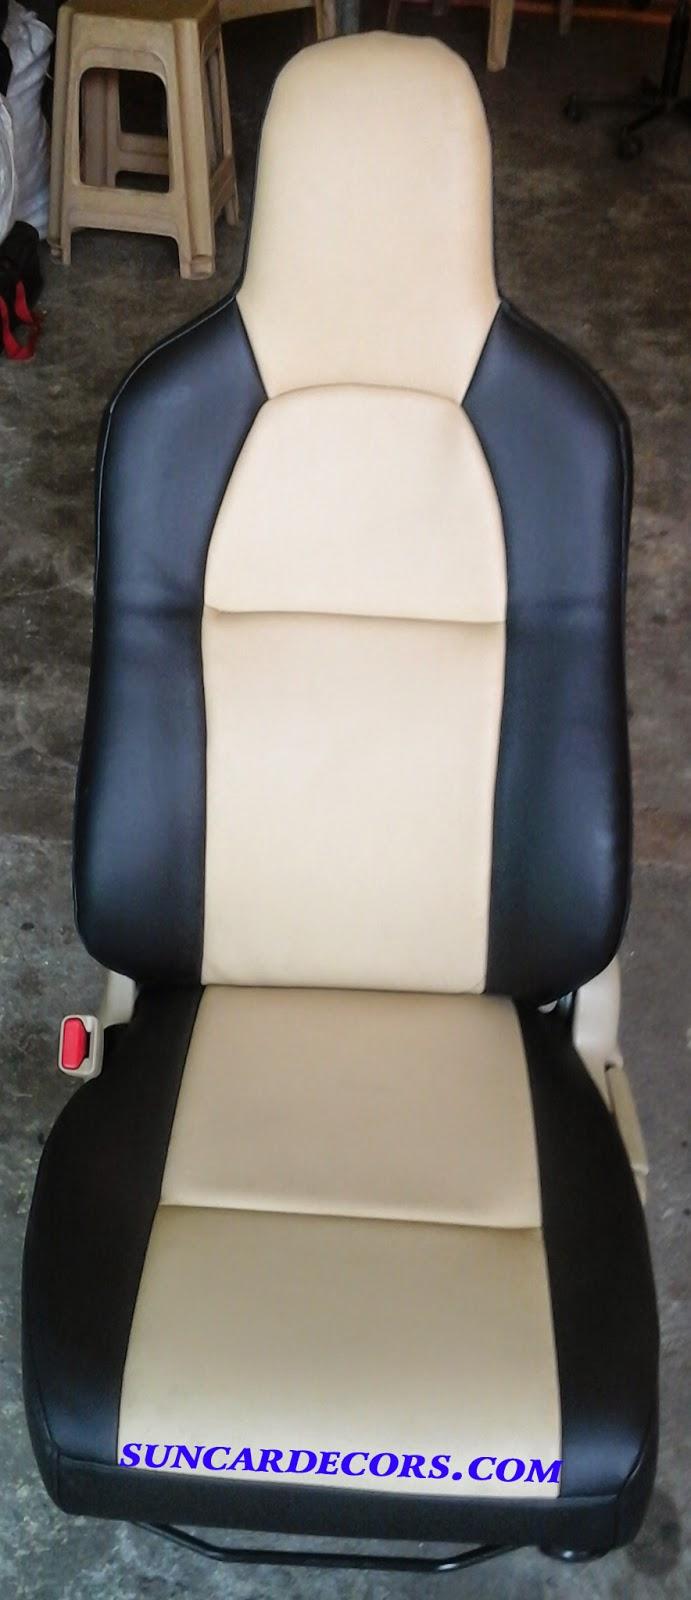 Car stickers design in coimbatore - Car Seat Covers In Coimbatore